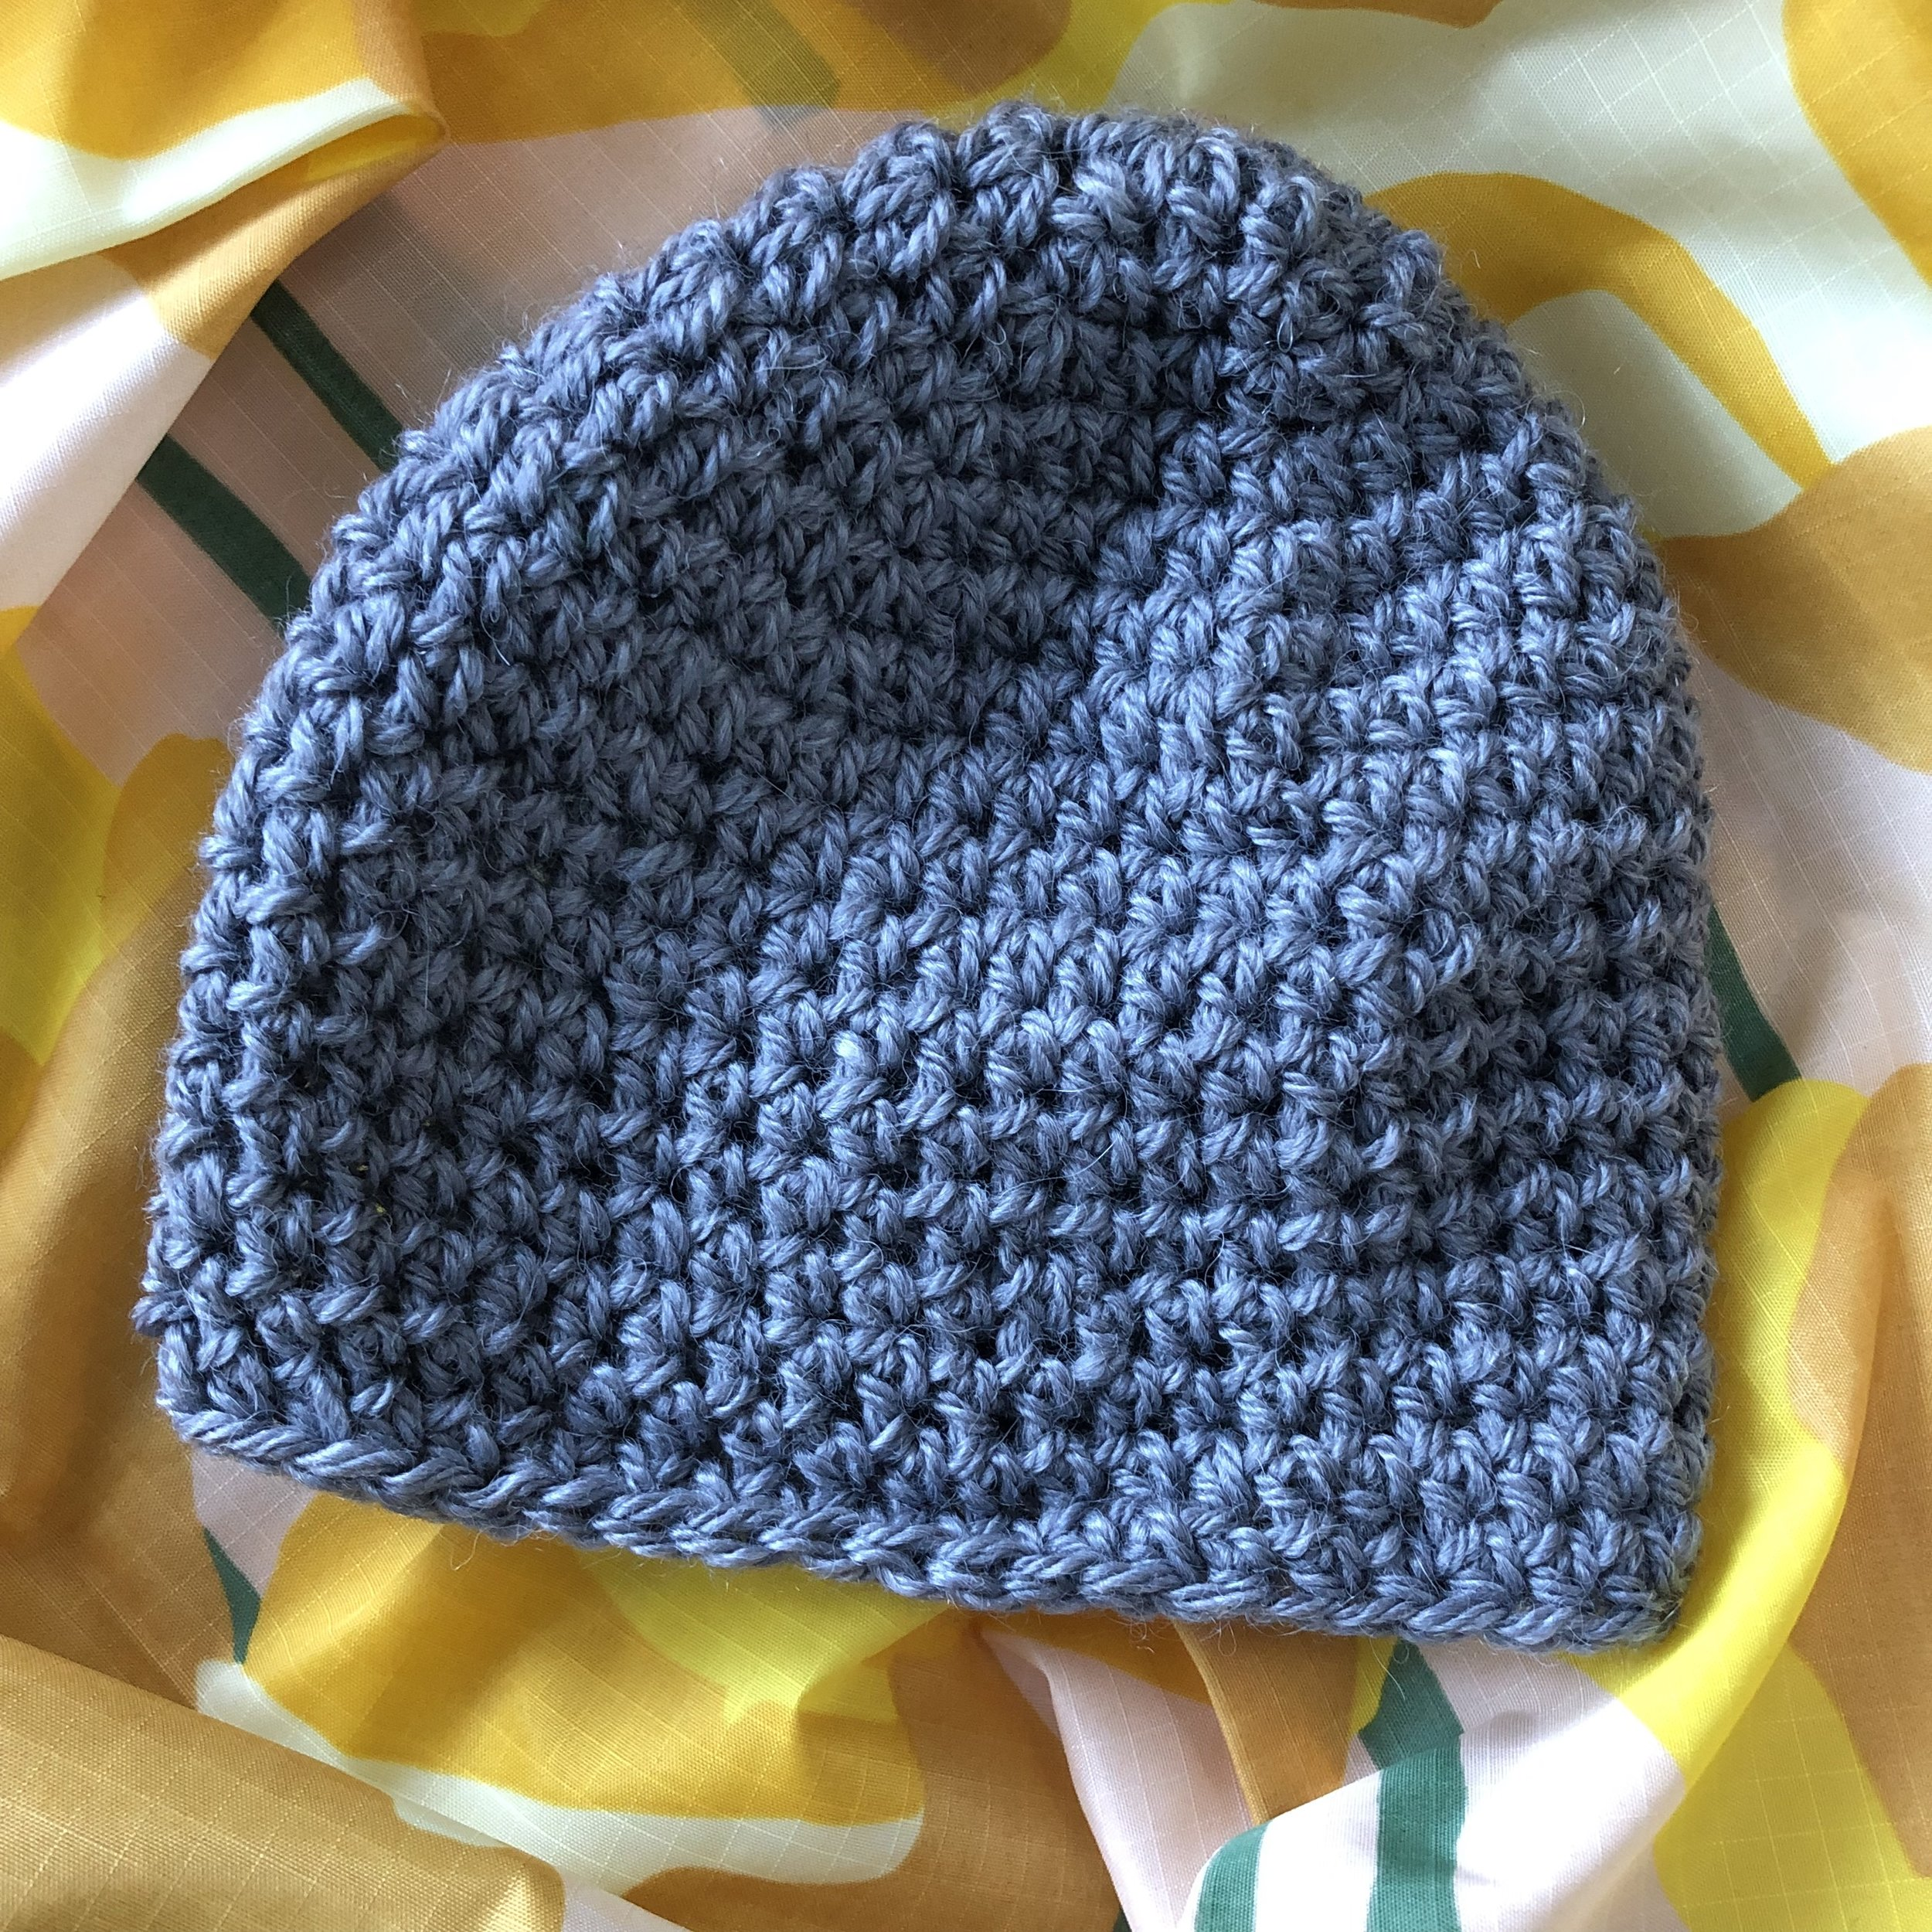 jordan_kushins_crochet_beanie.jpg